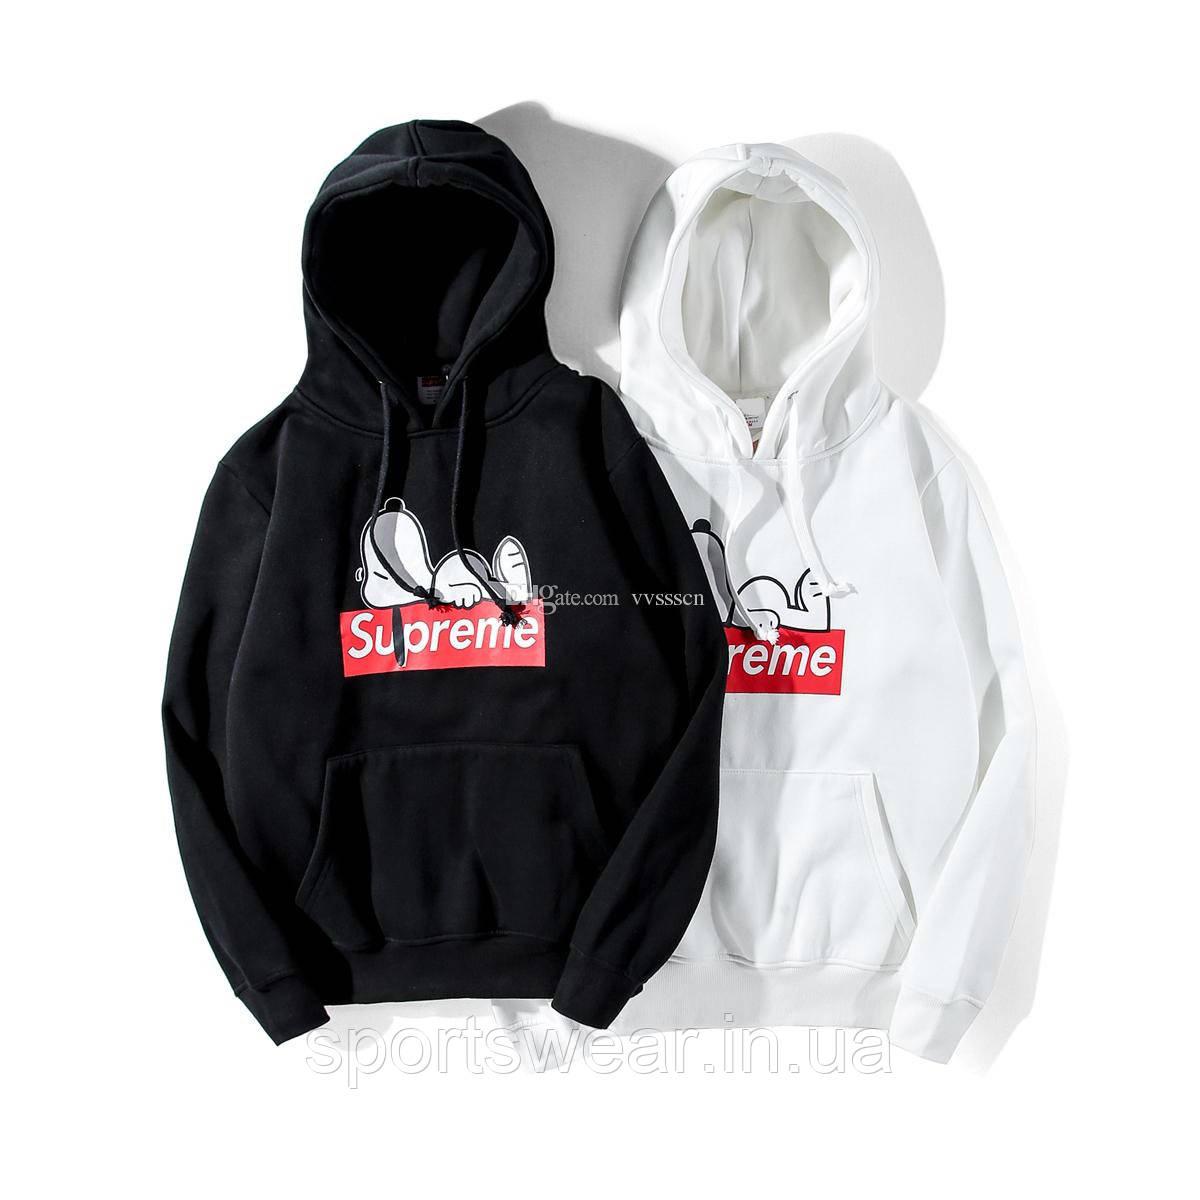 Худи Supreme Pepi белое, чёрное с логотипом, унисекс